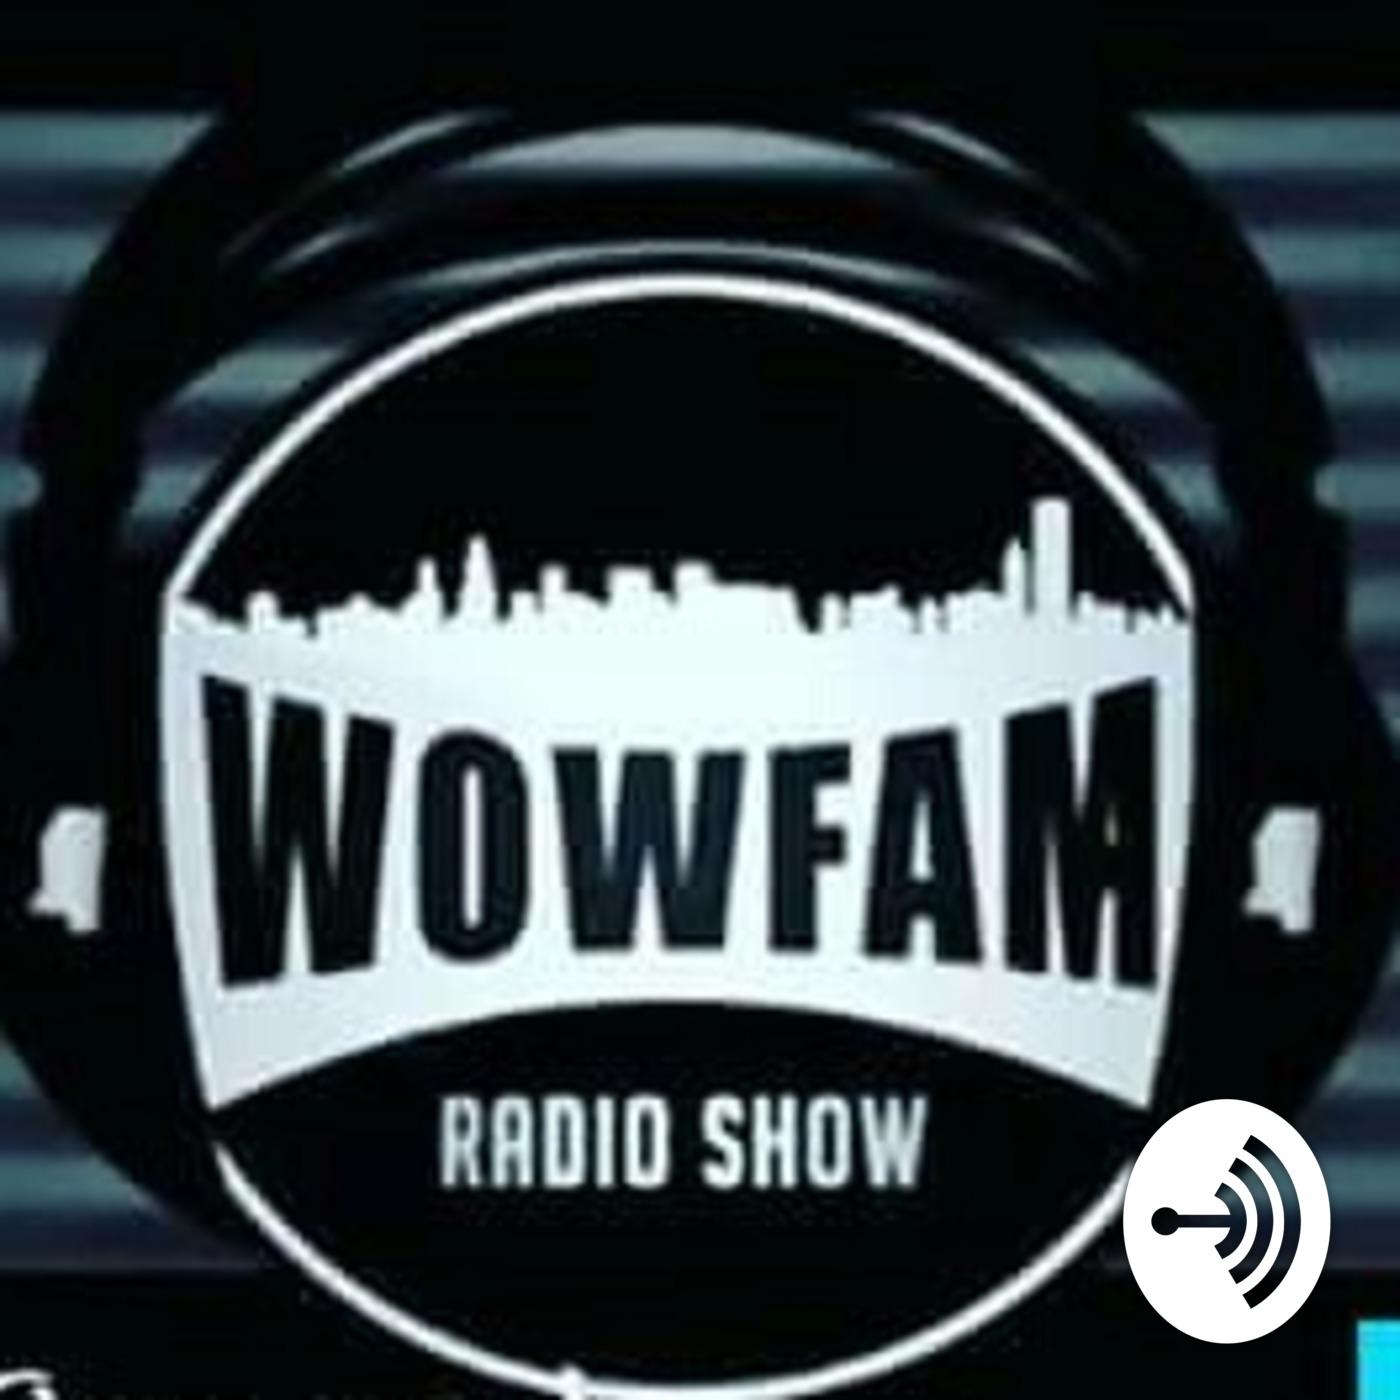 WOWFAM RADIOSHOW   Listen Free on Castbox